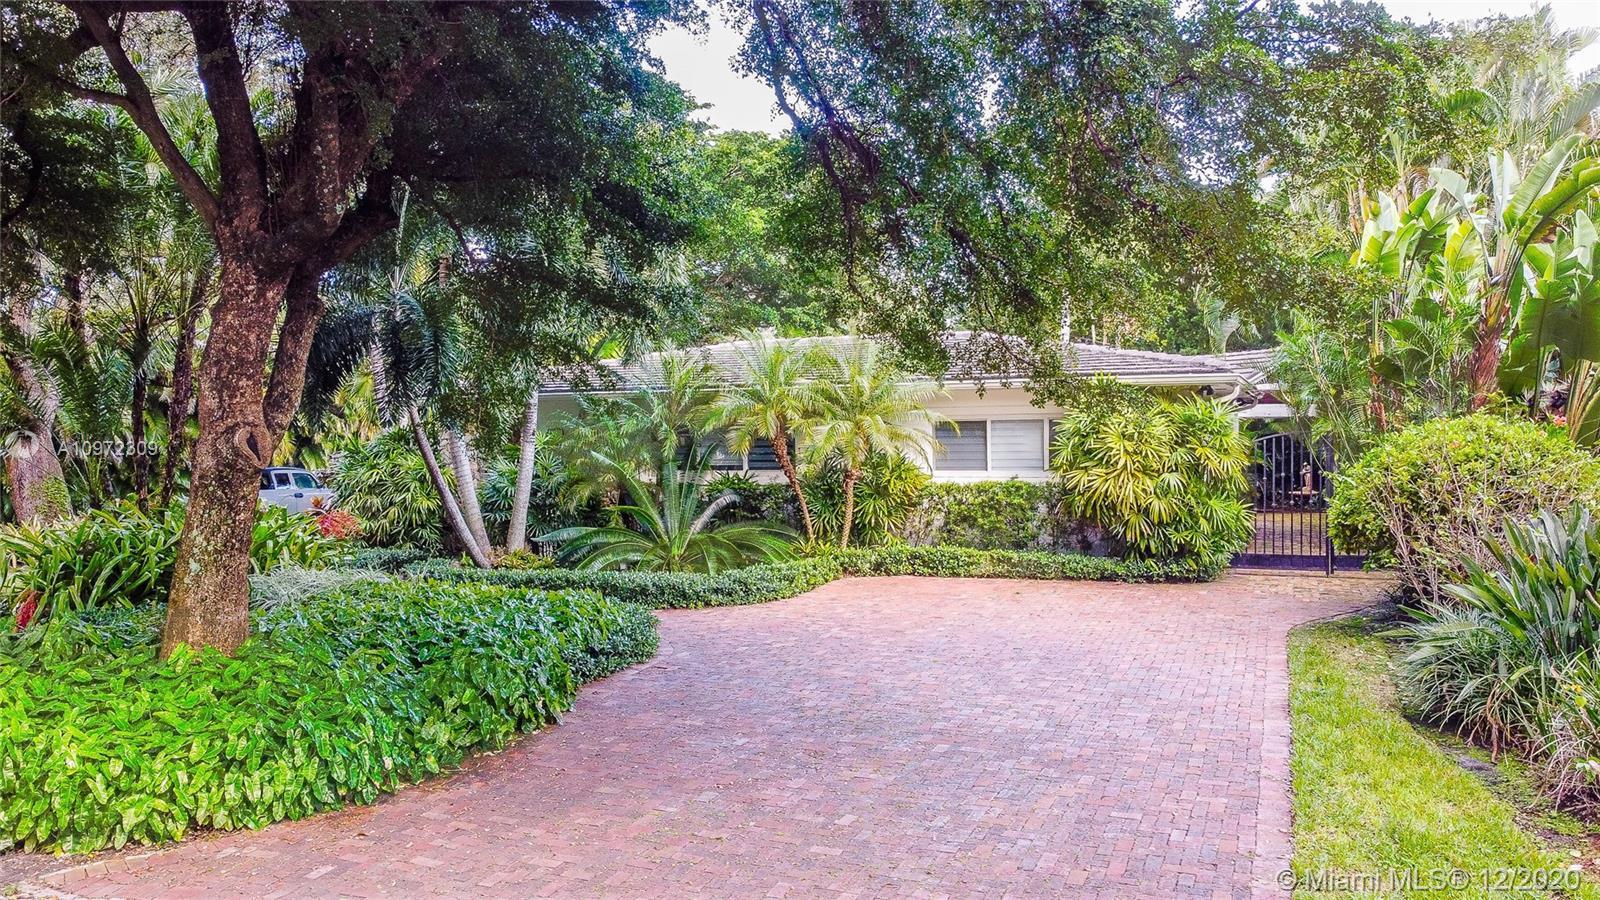 South Miami - 4301 Anderson Rd, Coral Gables, FL 33146